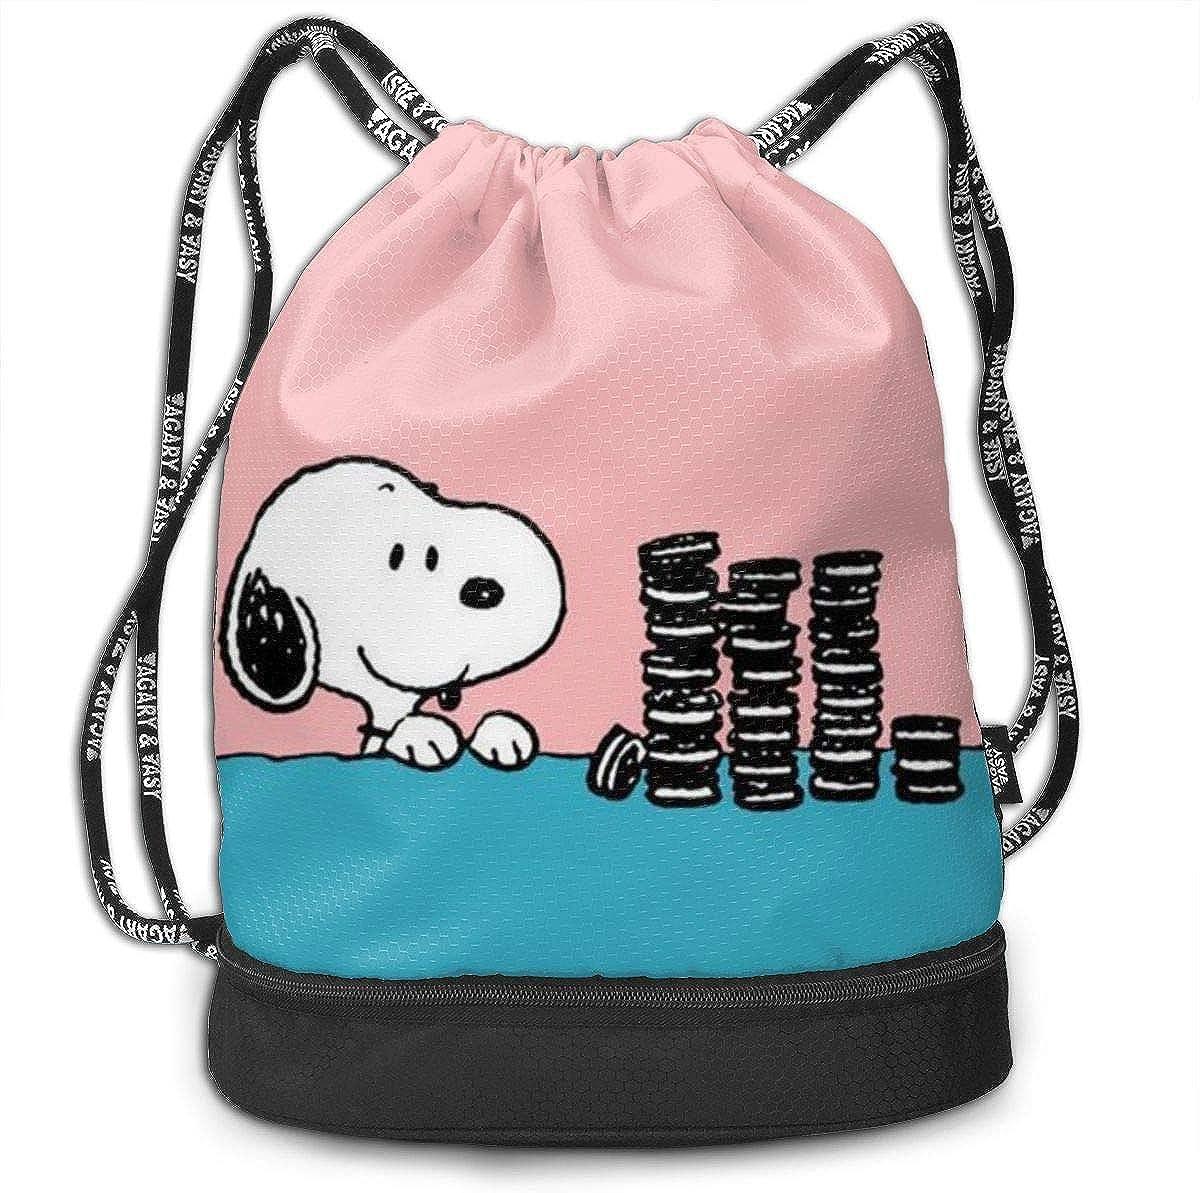 thegymyarraville.com.au Boweike Drawstring Bag Stylish Cute Snoopy ...